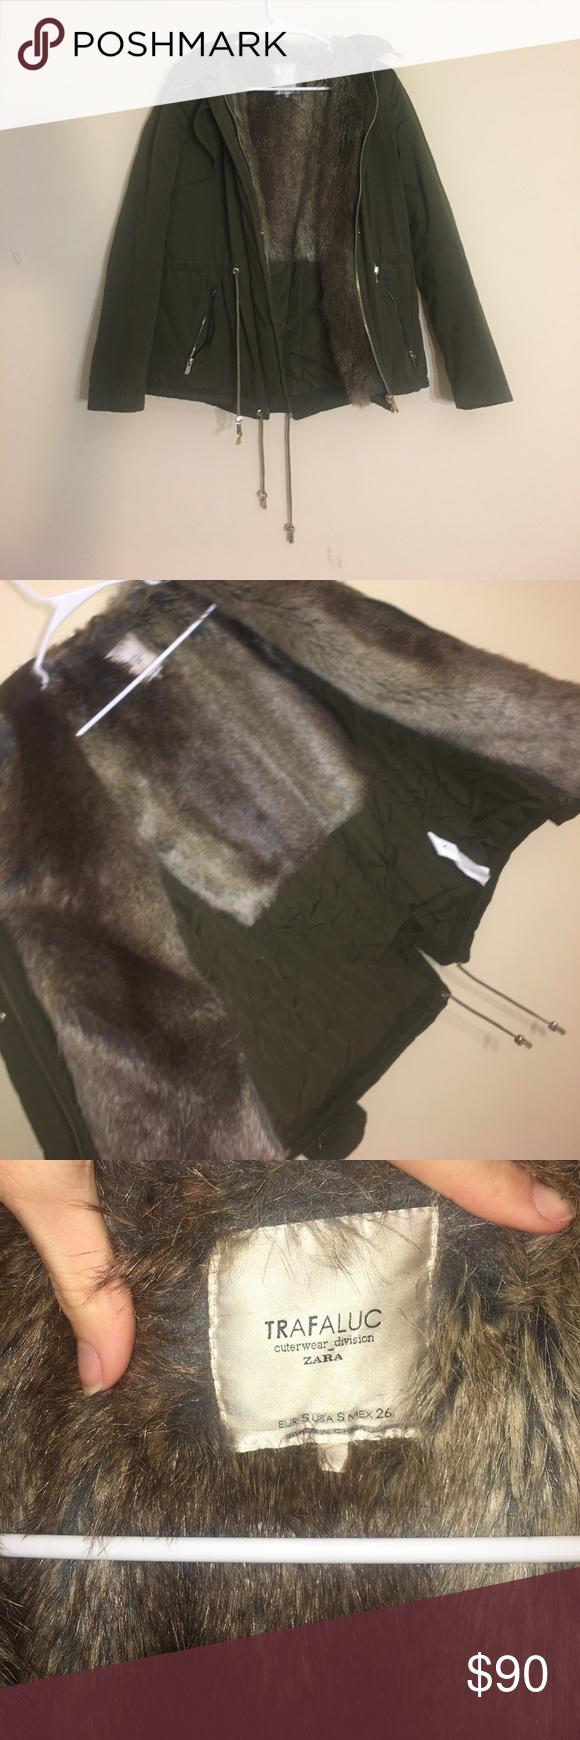 Trafaluc Outerwear Division Zara Fur Jacket Zara Olive Green Jacket Trafaluc [ 1740 x 580 Pixel ]